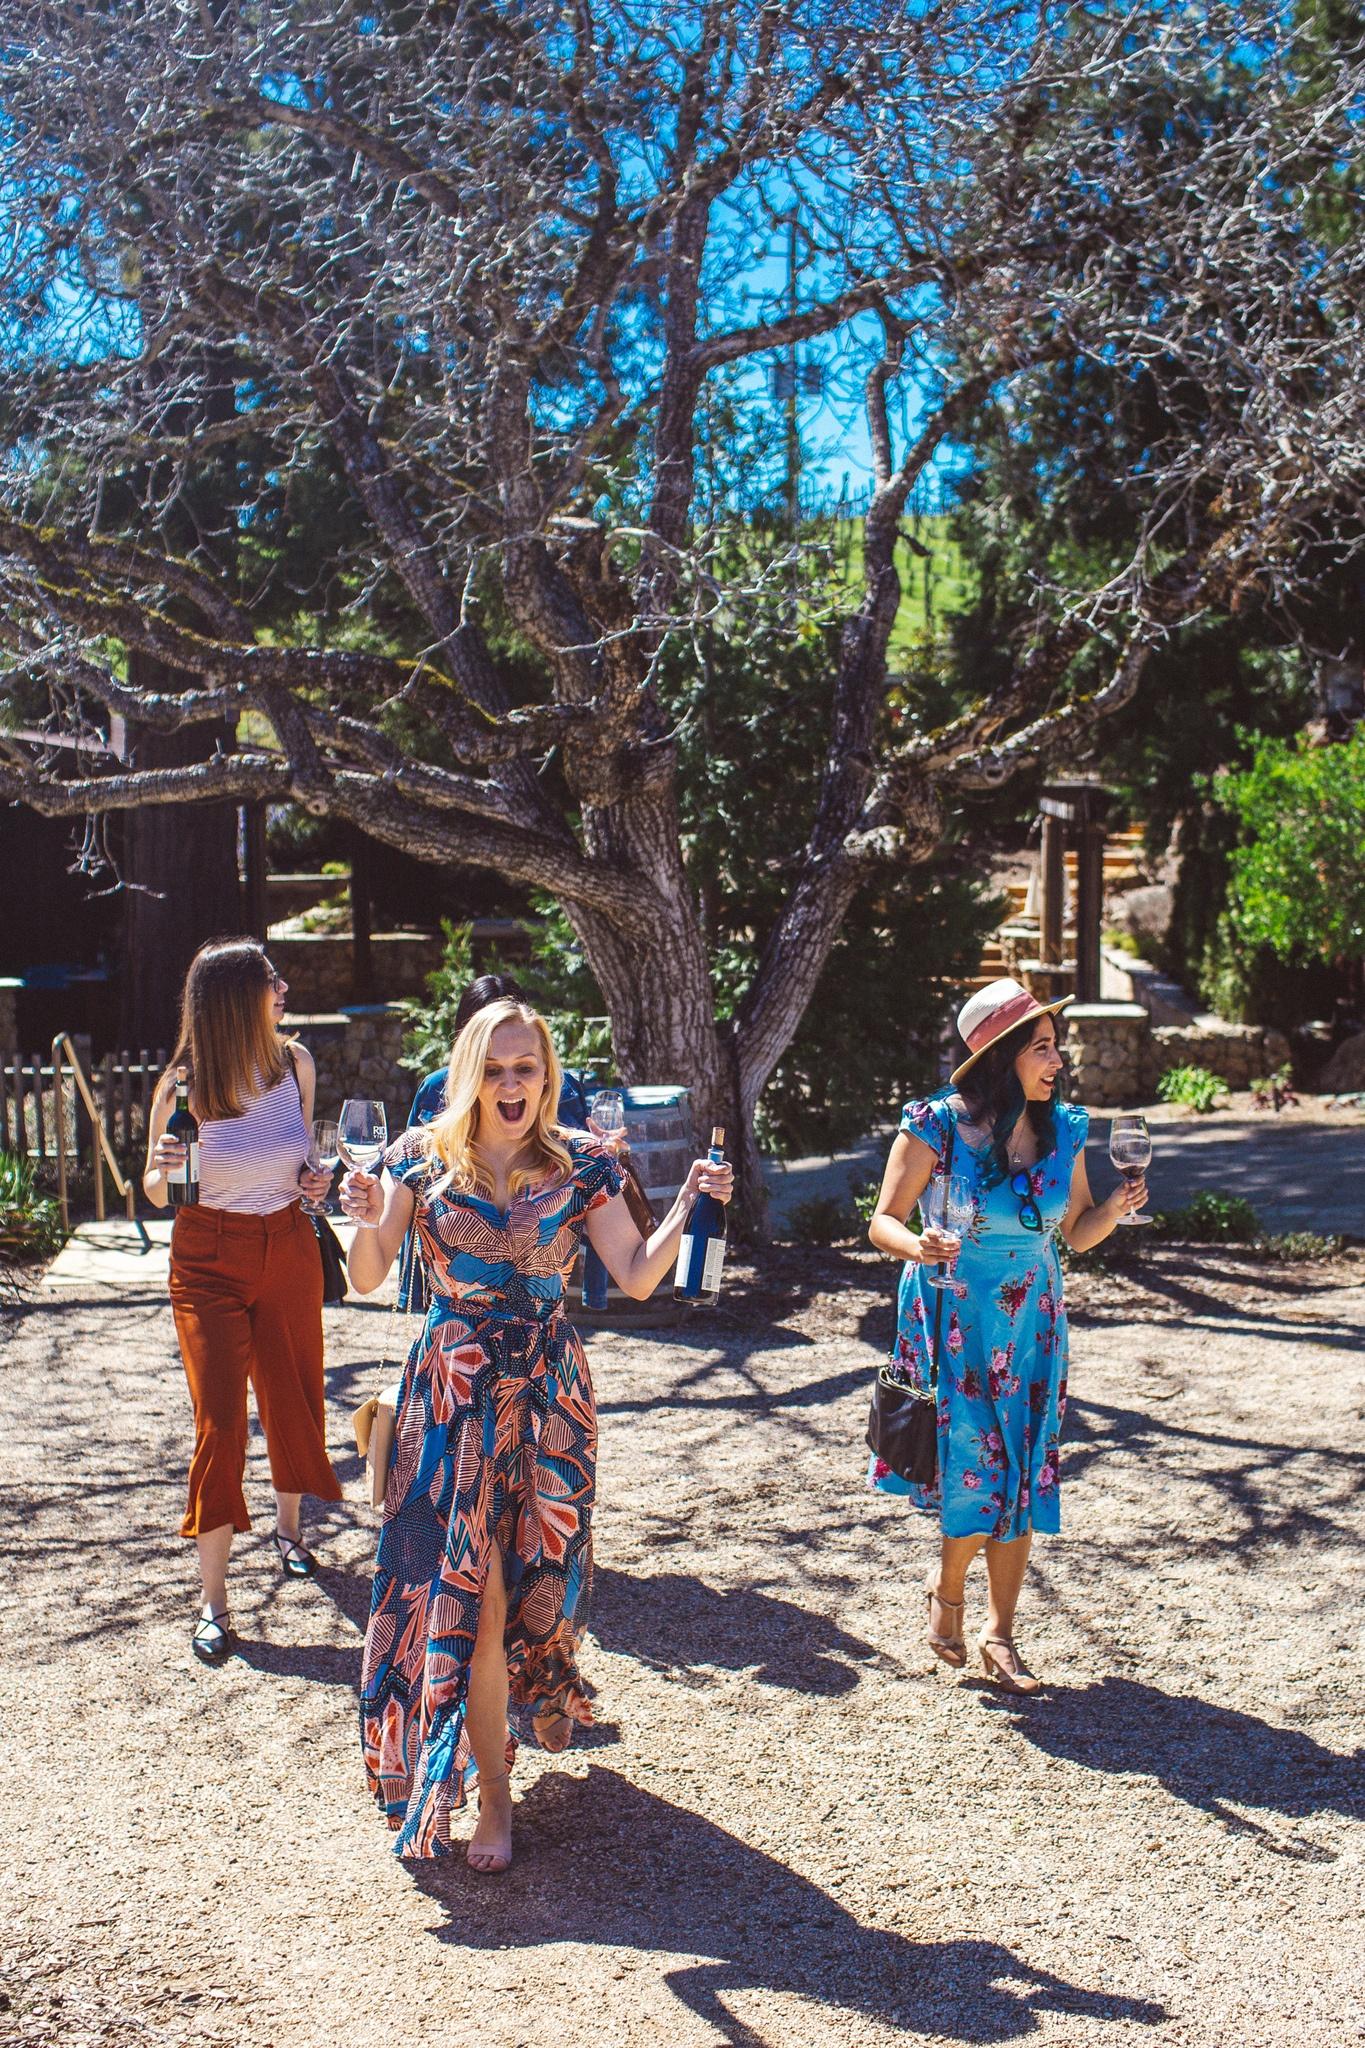 Women at Testarossa Winery in the Santa Cruz Mountains